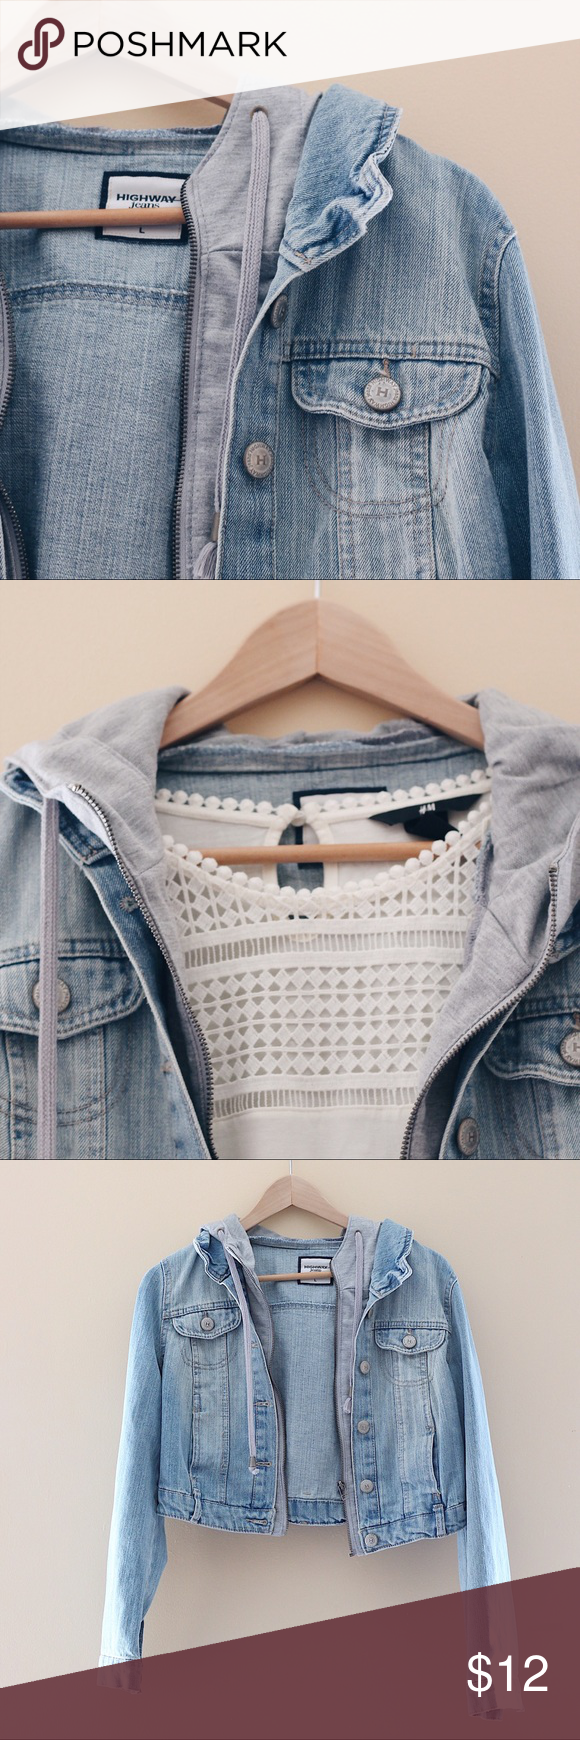 Delia S Cropper Hoodie And Jean Jacket Combo Jackets Hoodie Material Jean Jacket [ 1740 x 580 Pixel ]